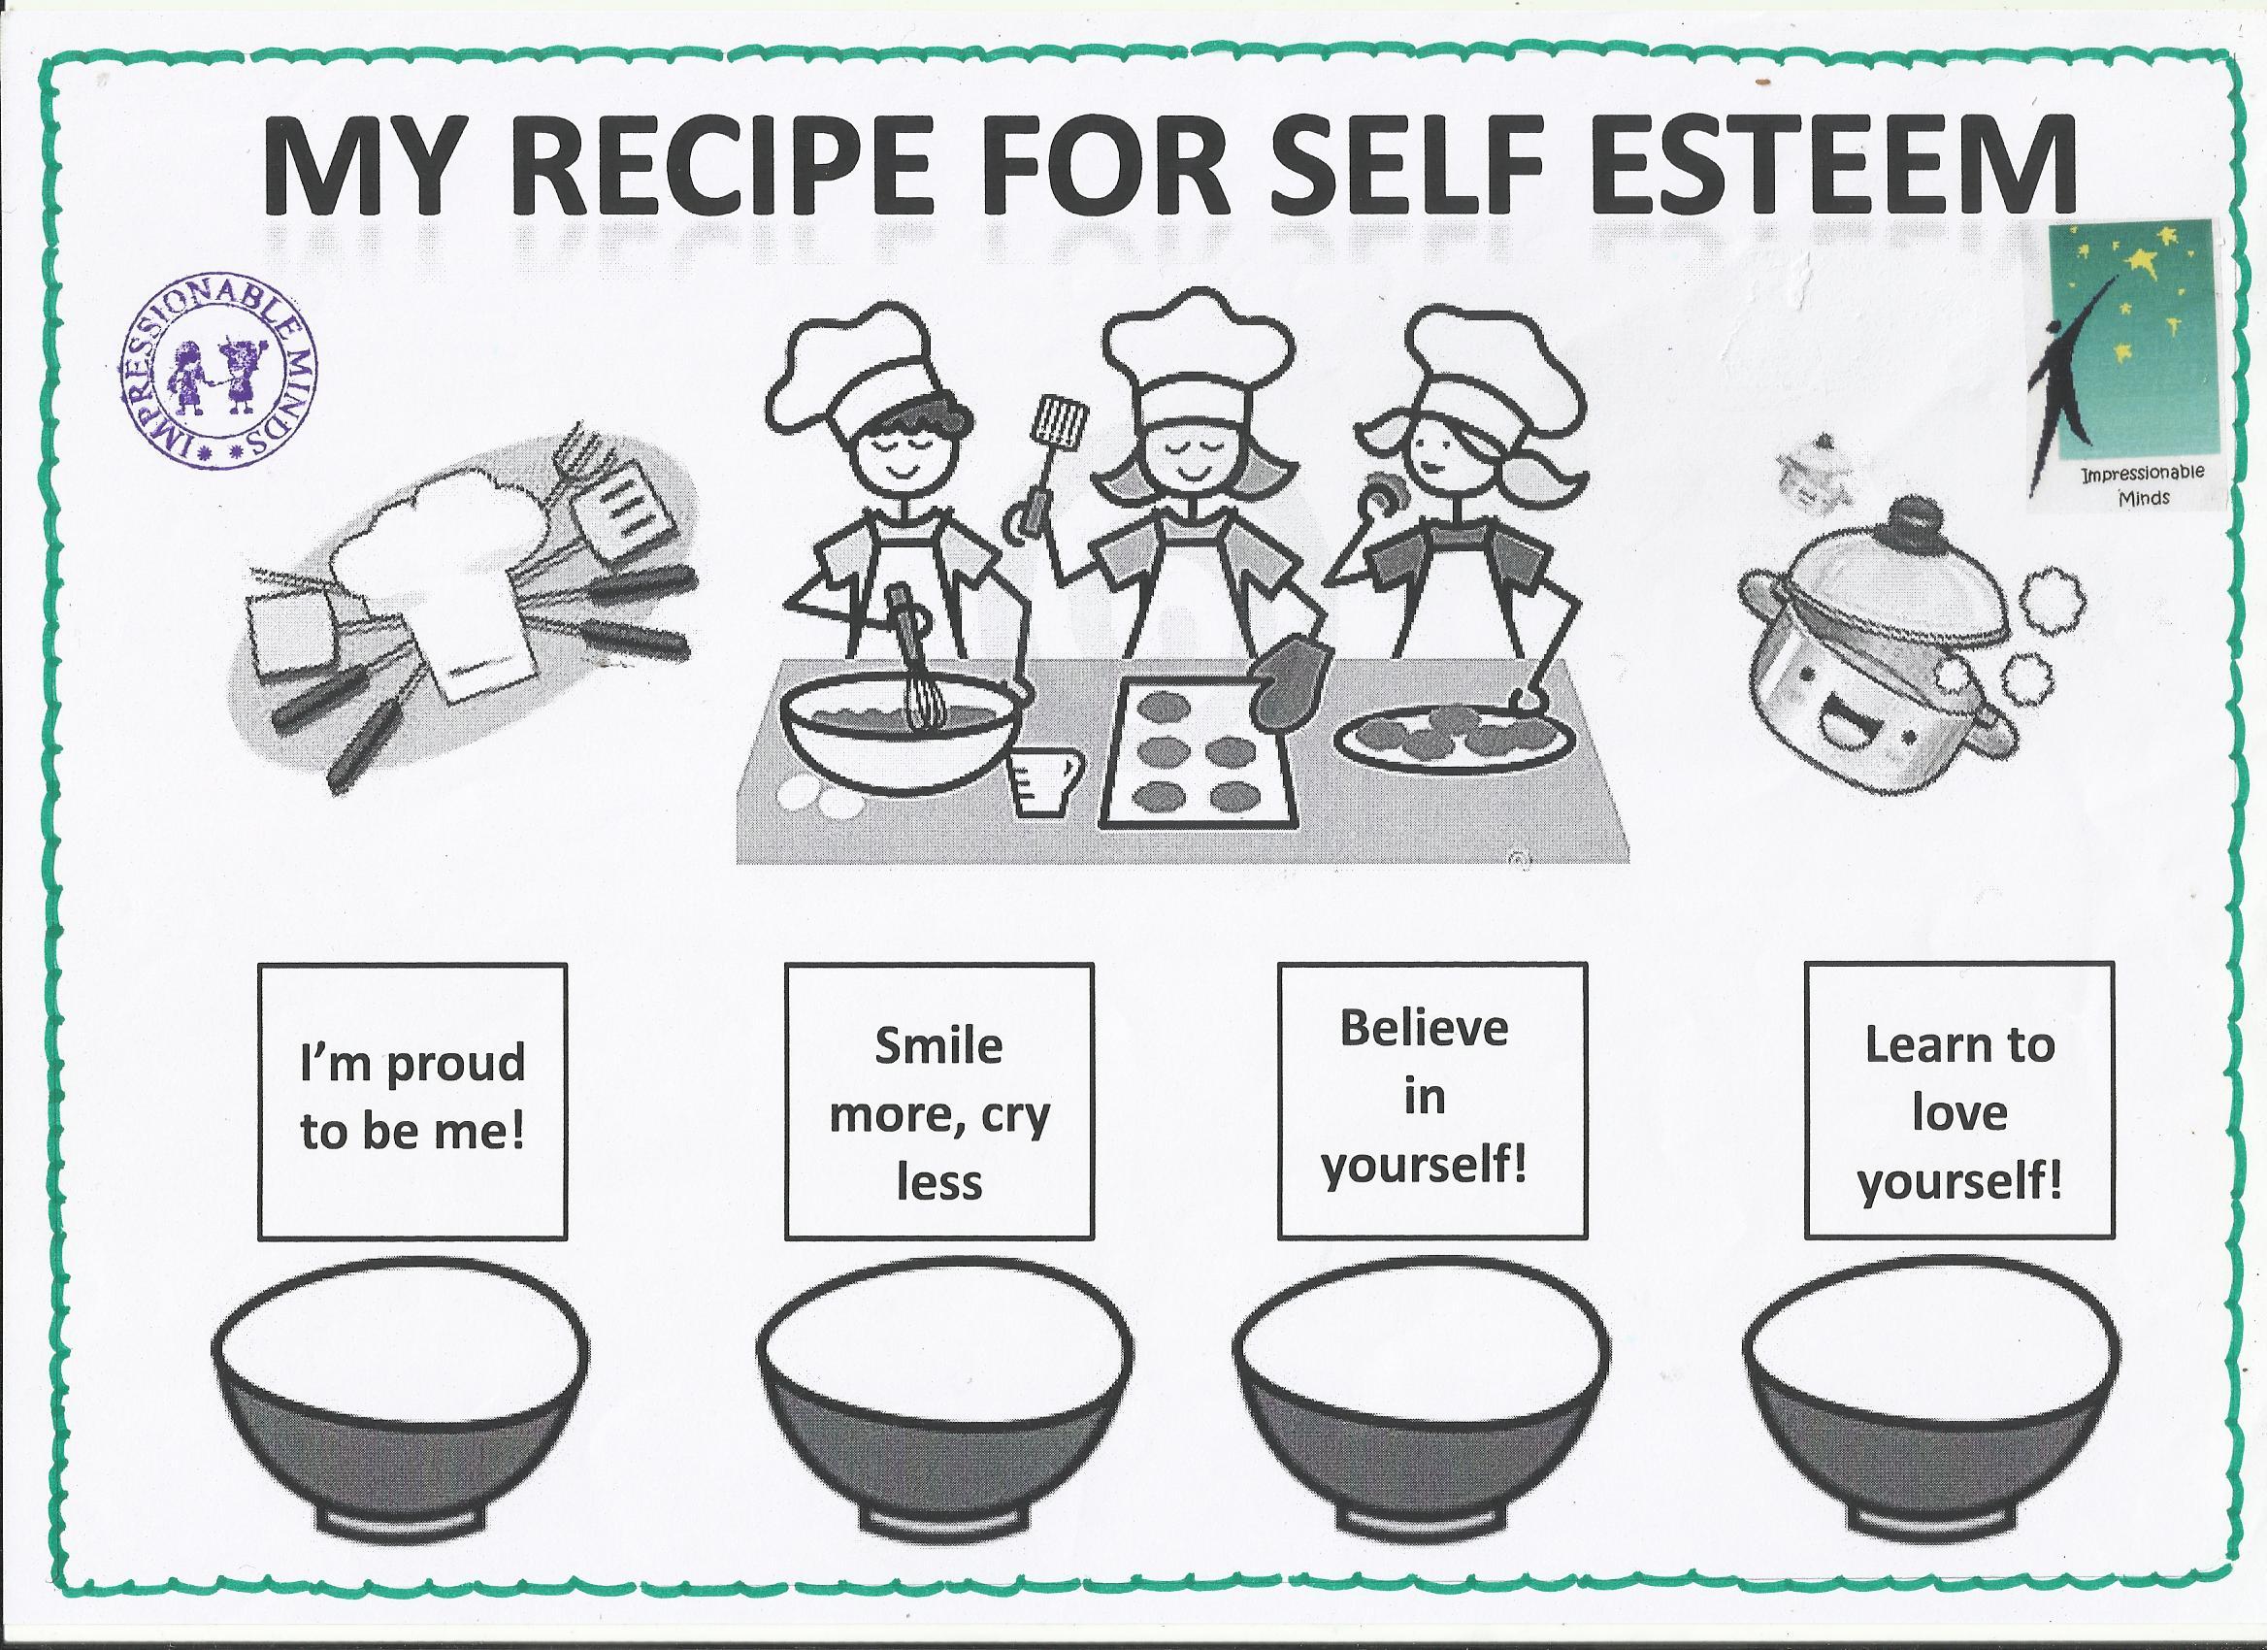 Self Esteem Love Yourself